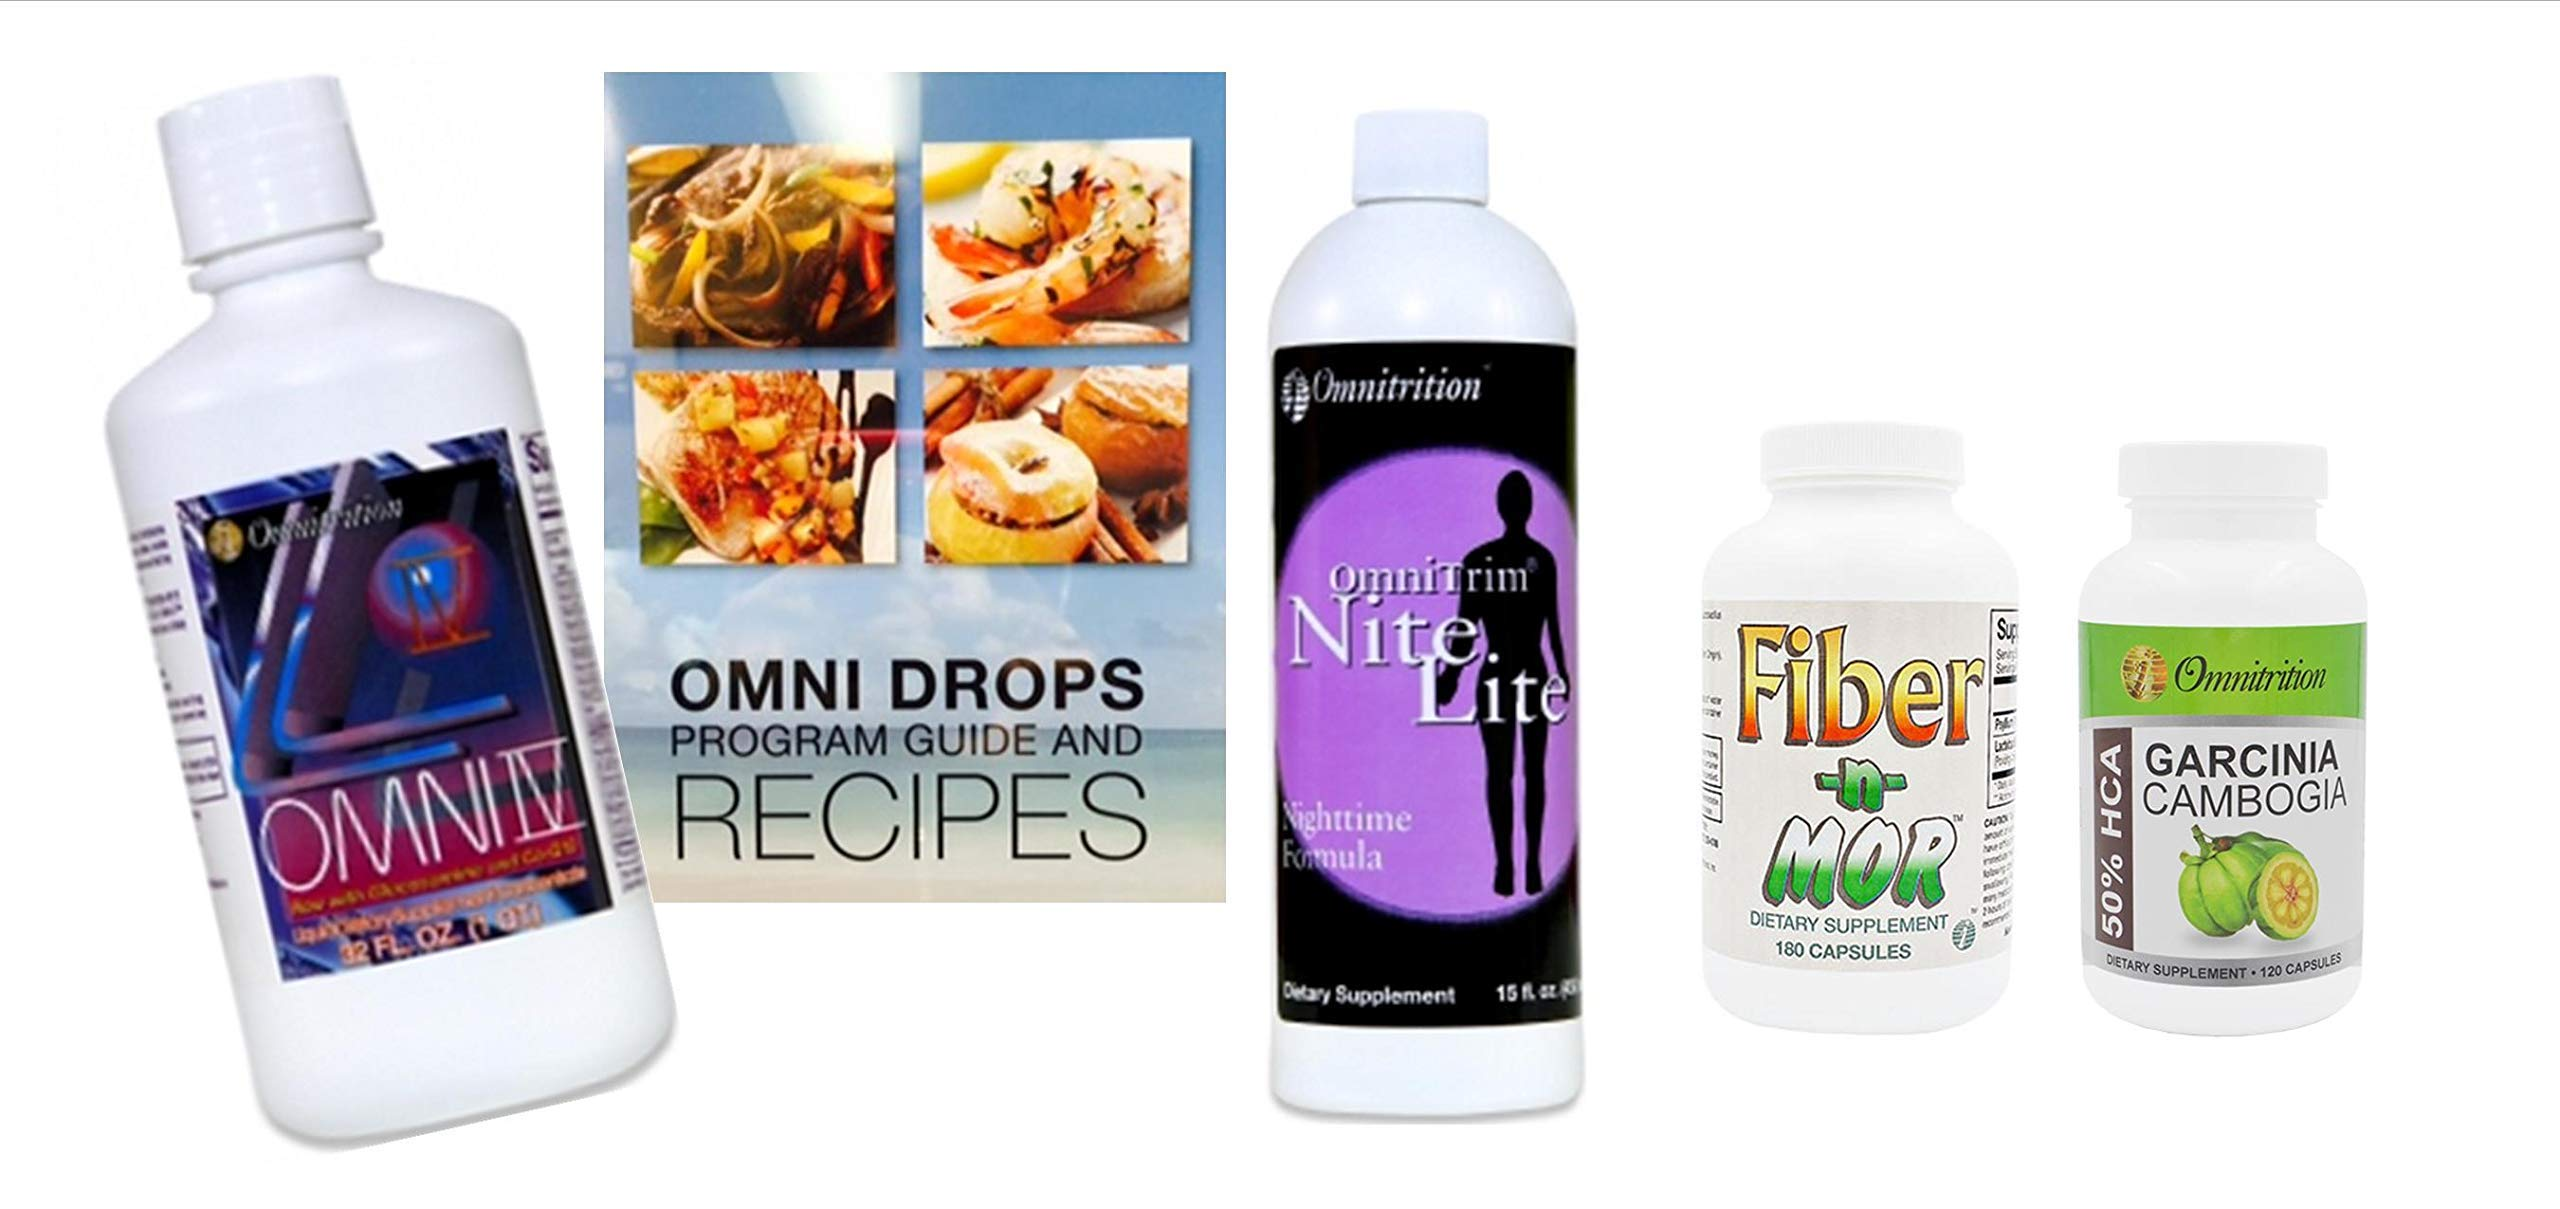 Omni Drop Program Bundle *Fab4 + GC* (Includes: Omni Drops w/Program Guide, Omni IV w/Glucosamine, OmniTrim Nite Lite, Fiber n Mor and Garcinia Cambogia Extract)